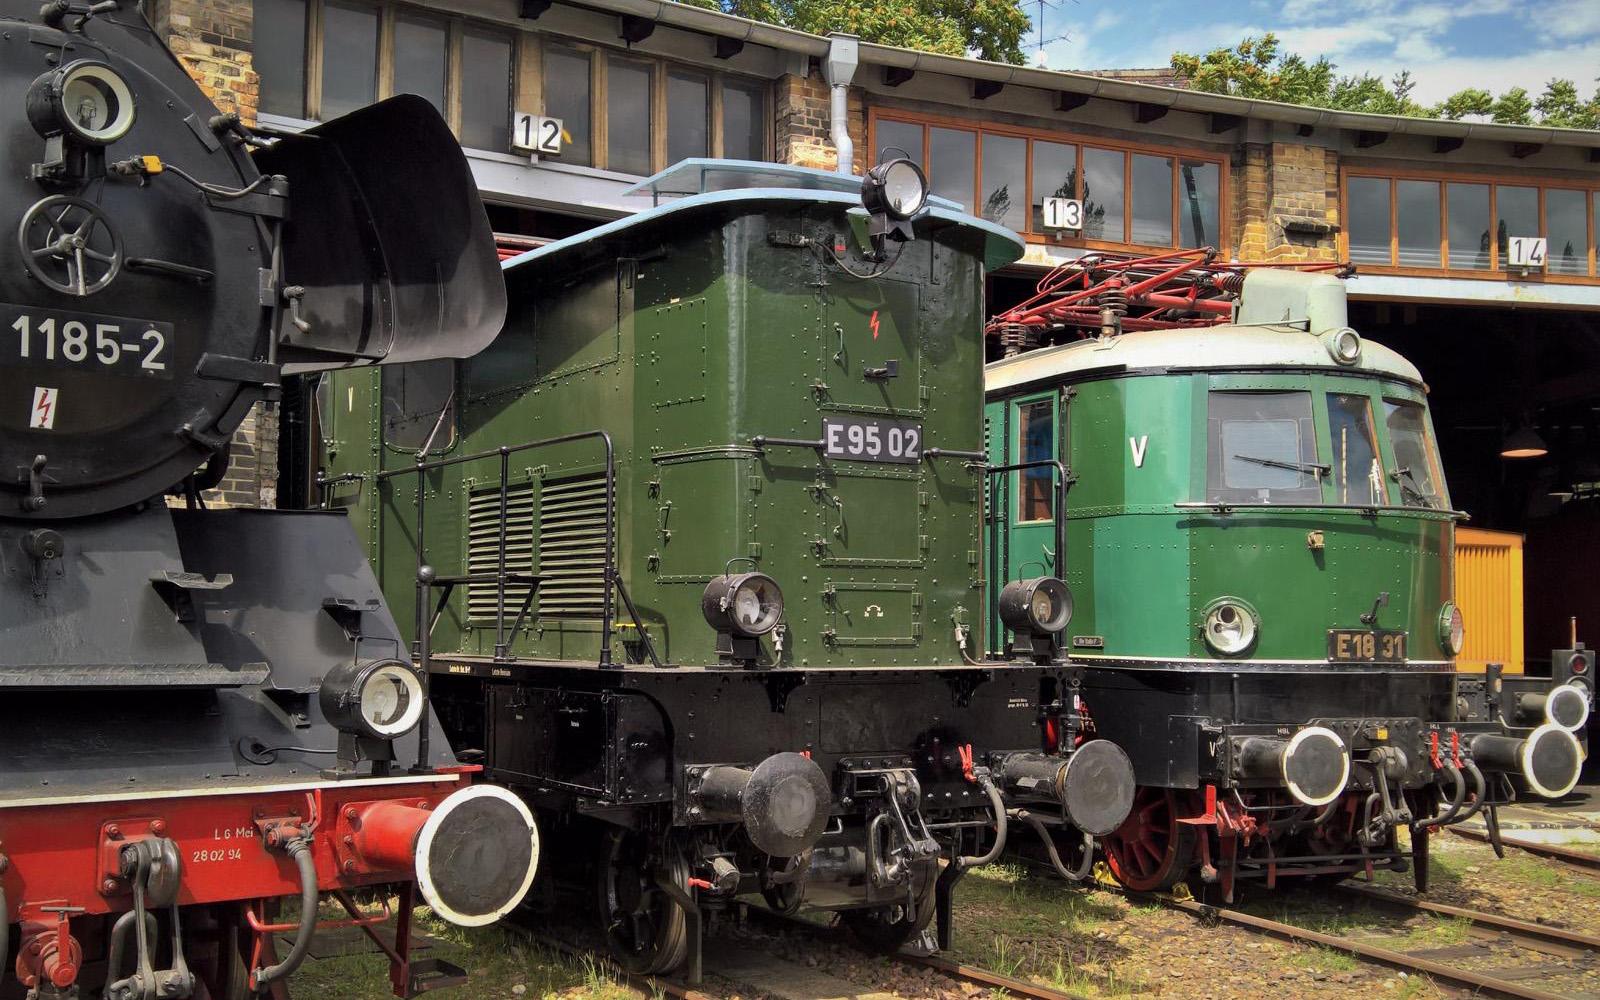 ©Foto: Christian Wodzinski   railmen   Güterzuglokomotive E95 02 BJ 1927 sowie die Elektrolokomotive 18 31 BJ 1937 im DB Museum Halle